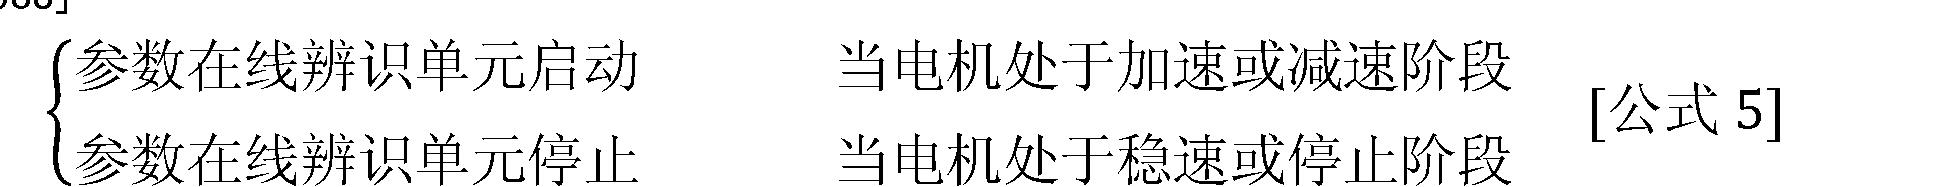 Figure CN102223134AD00083